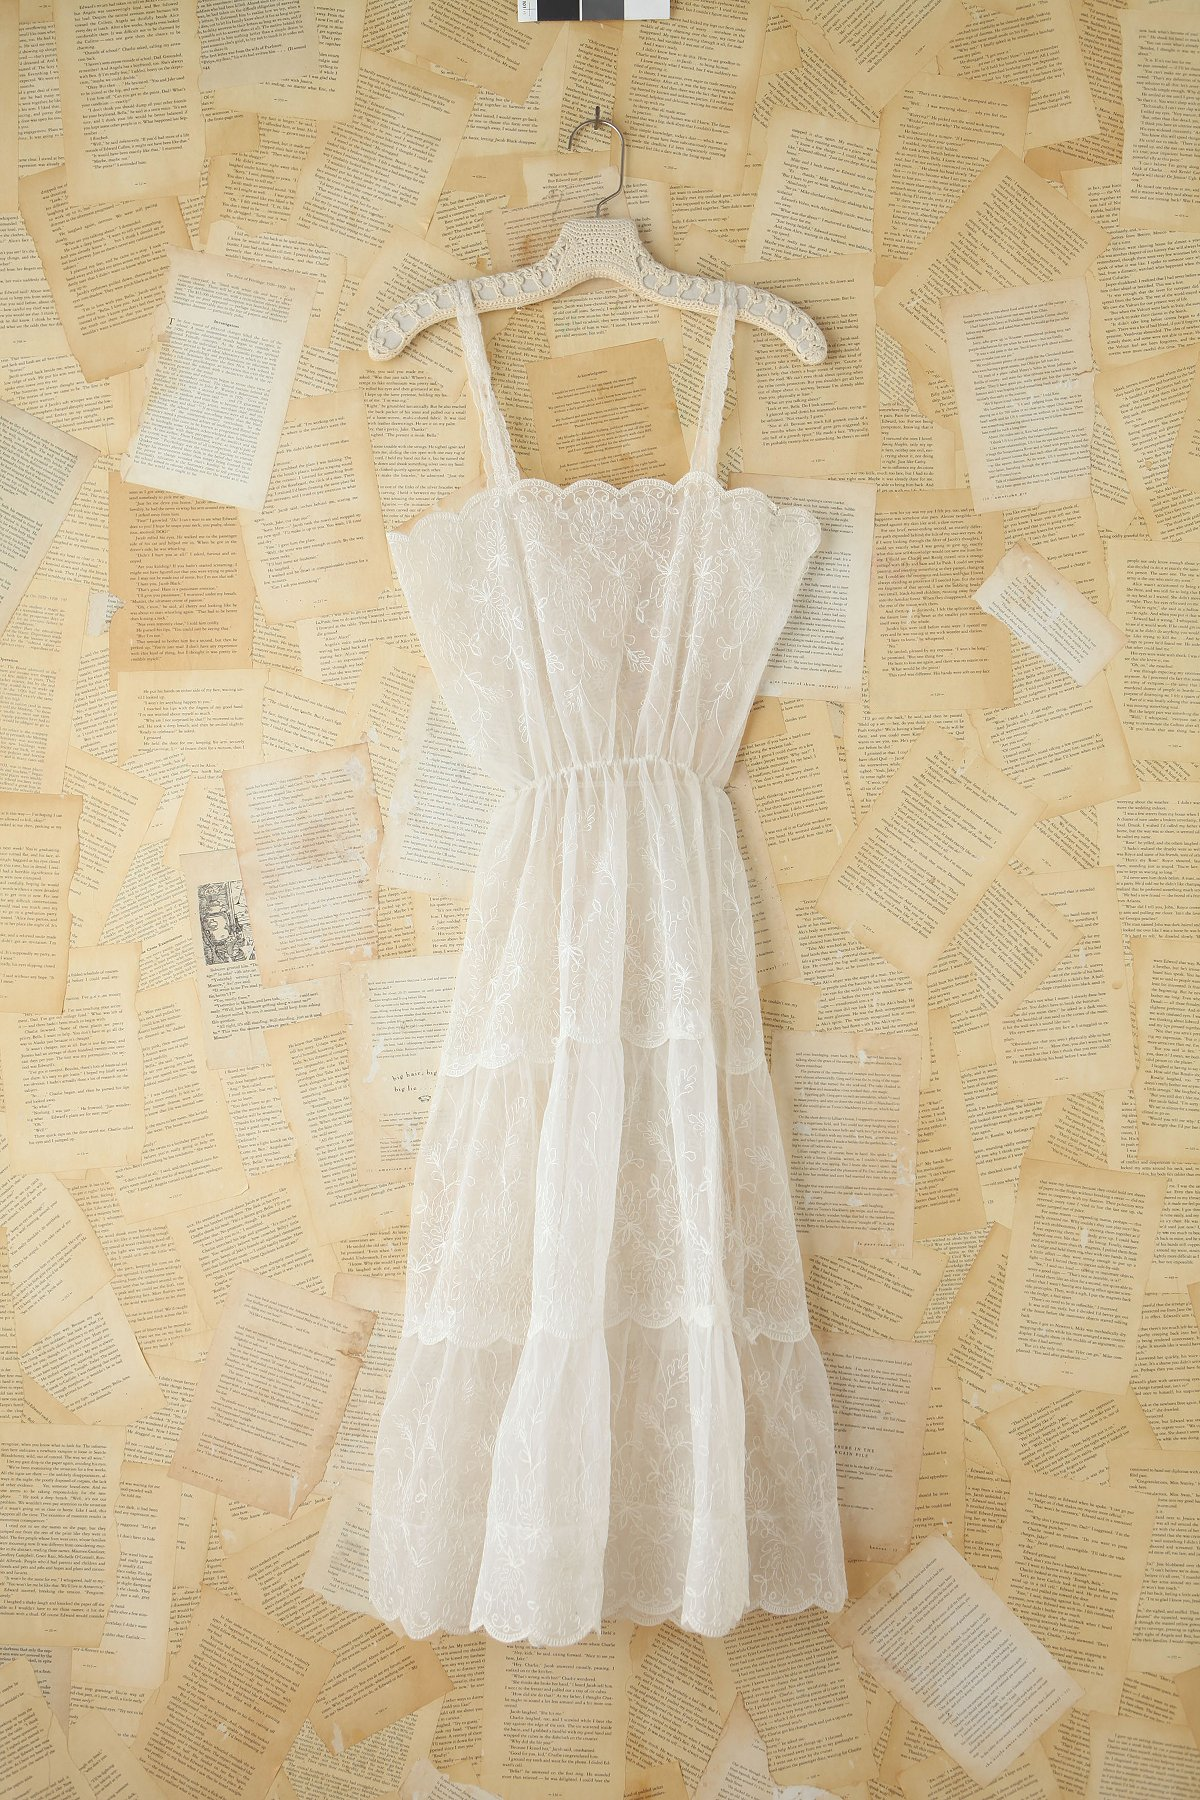 Vintage Cotton and Crochet Maxi Dress